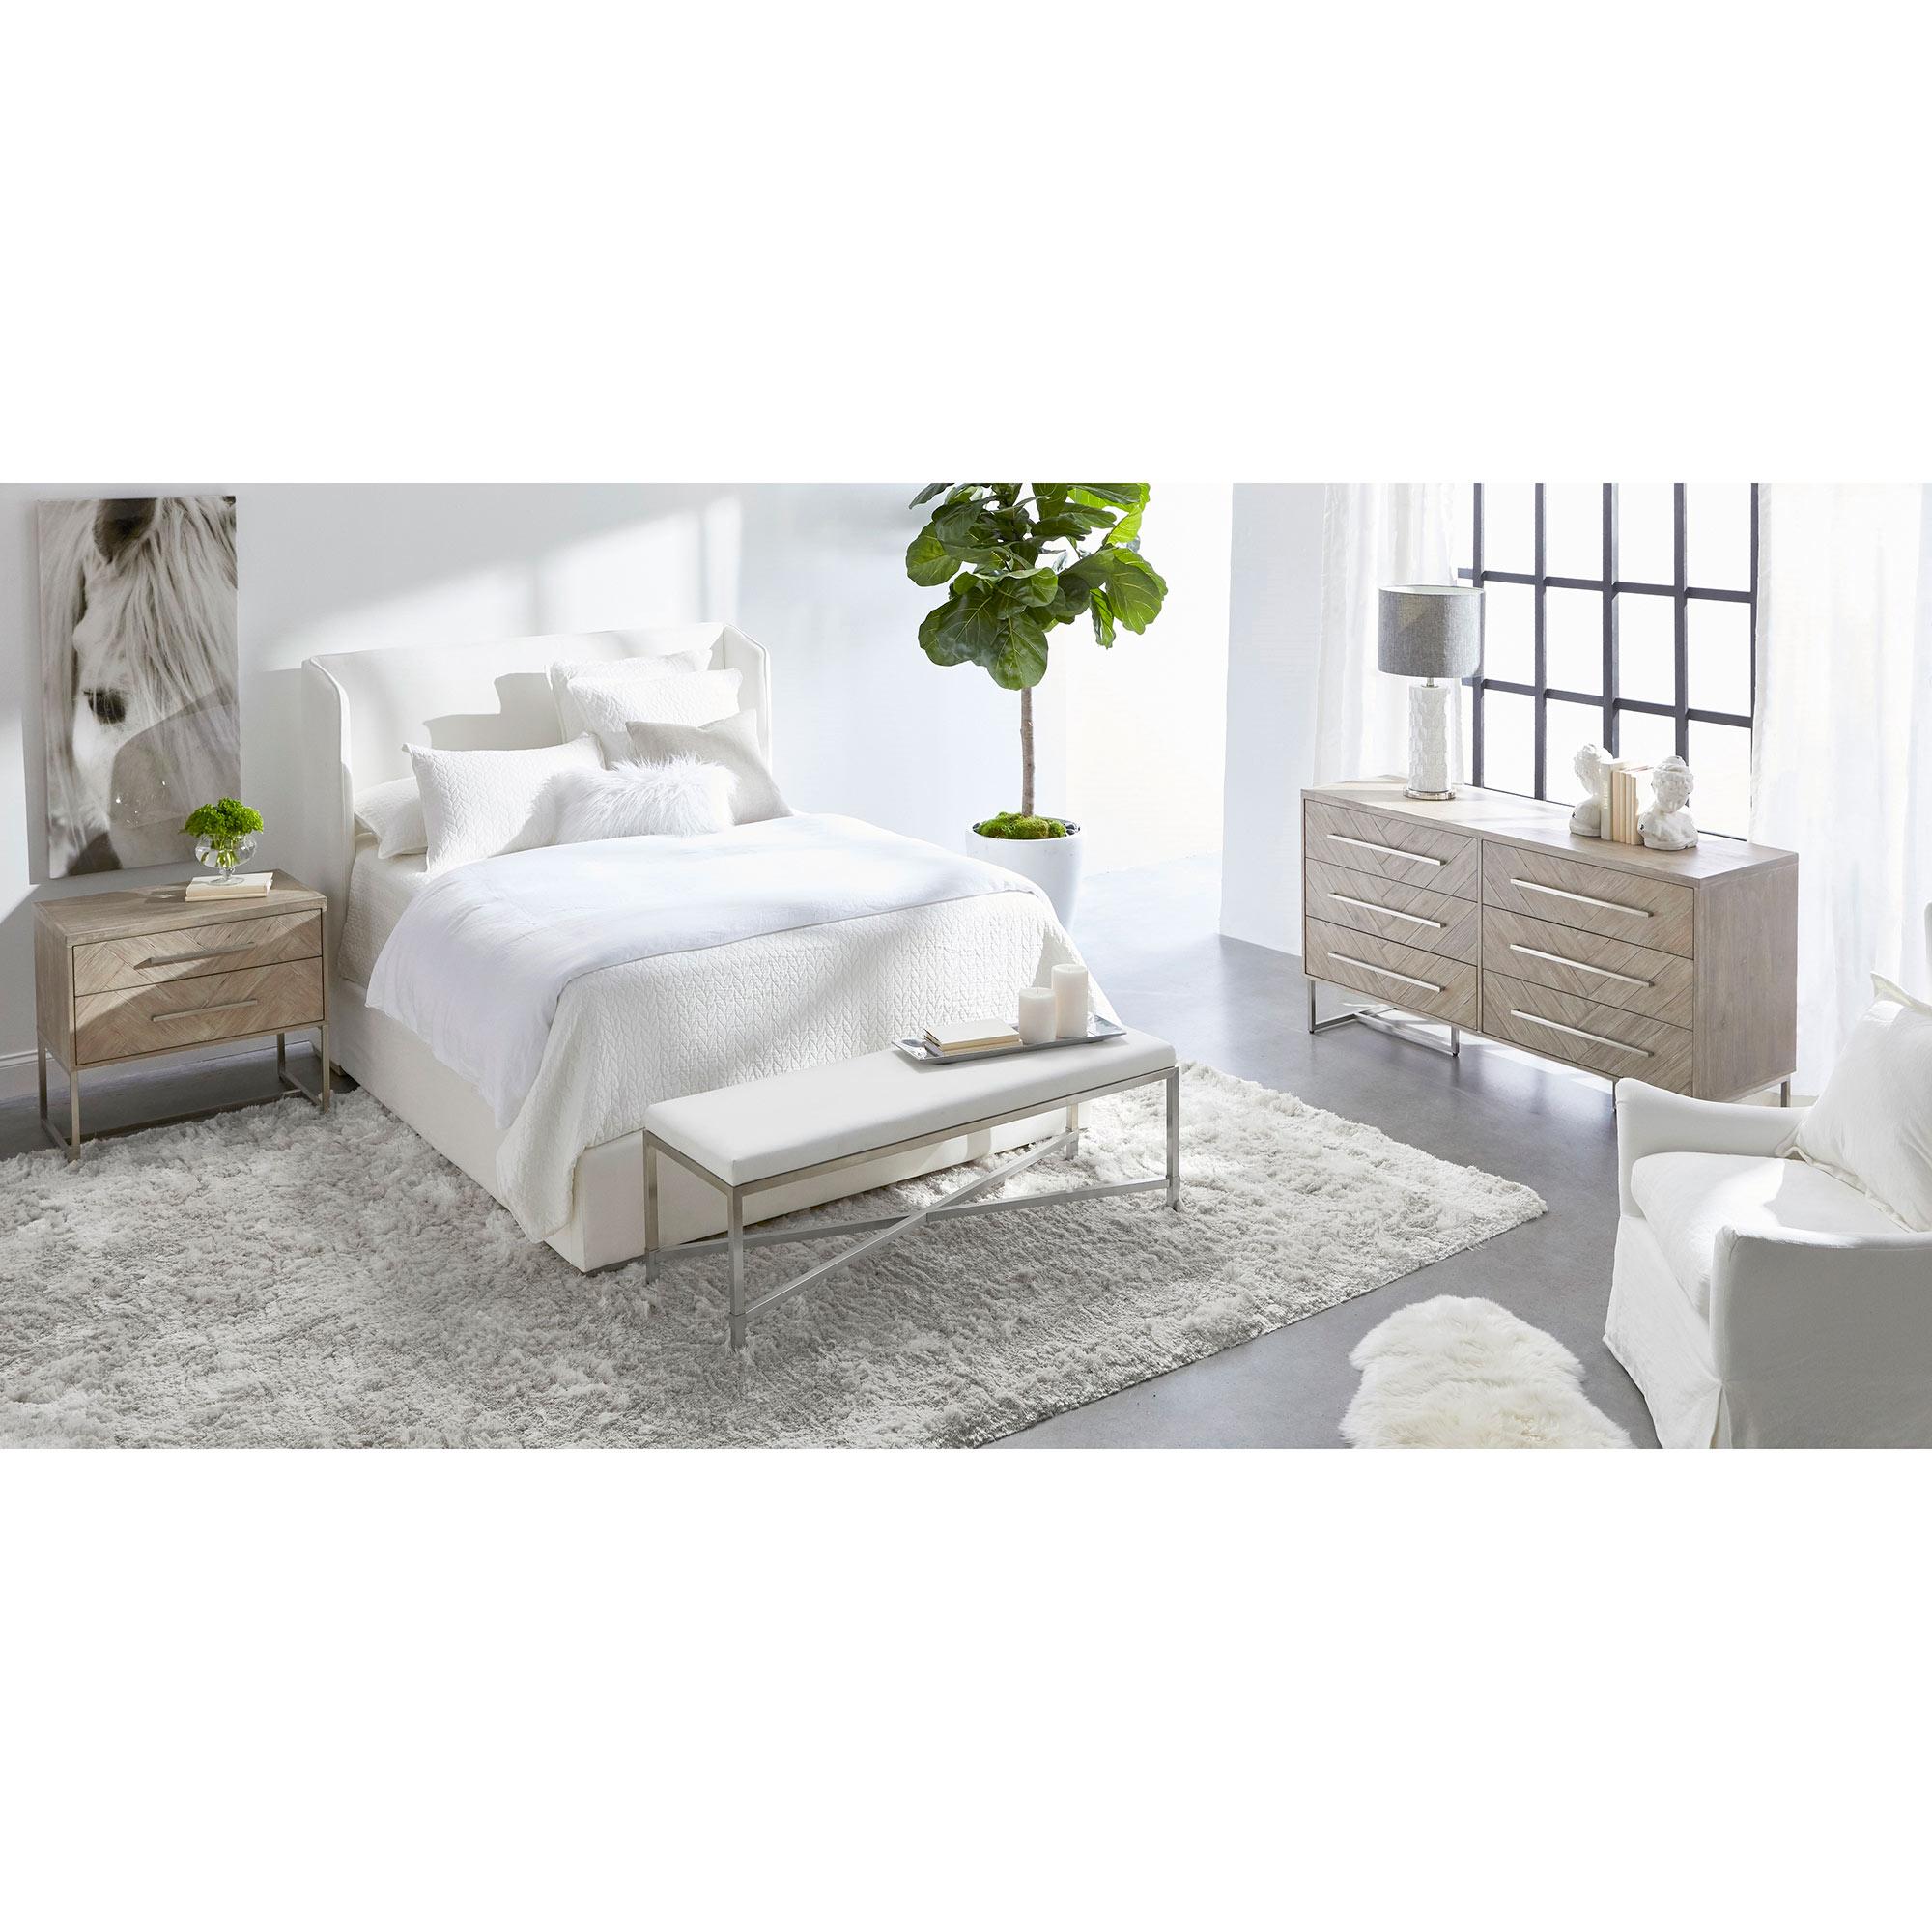 Moris Modern Classic 6-Drawer Stainless Steel Pulls Natural Grey Double Dresser